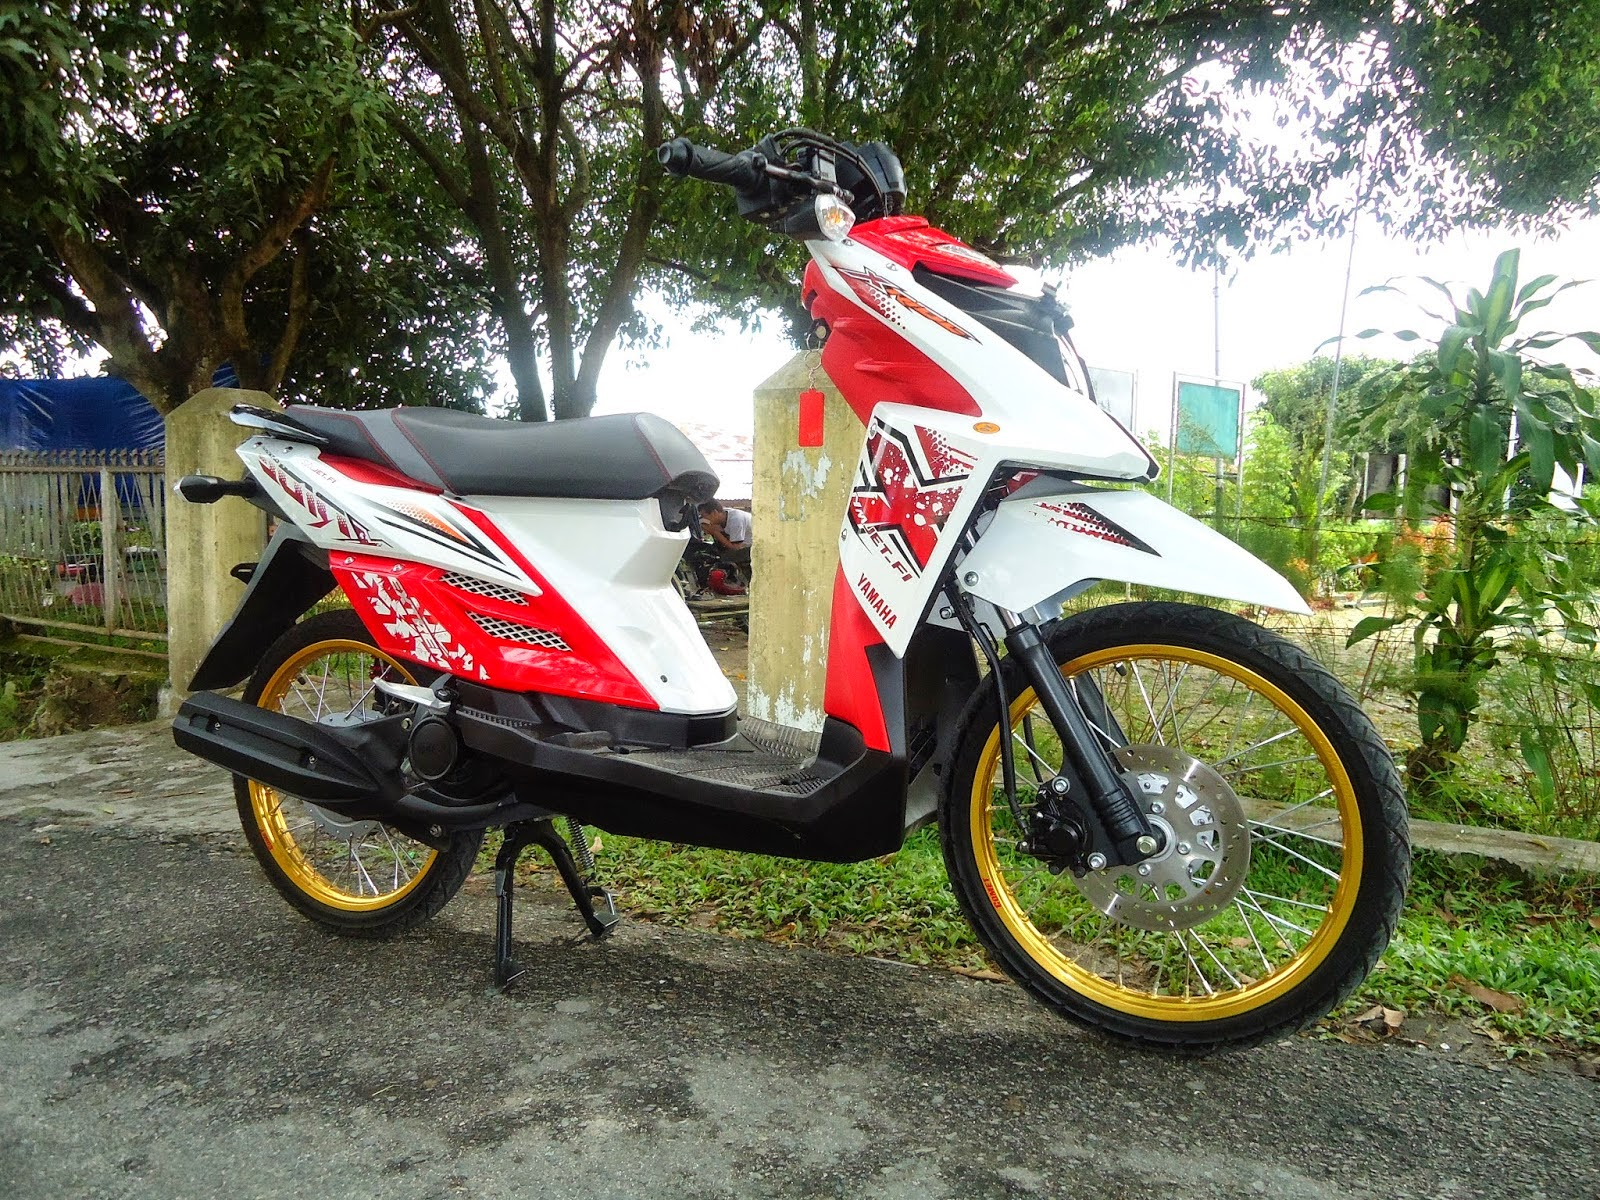 Modifikasi Motor Yamaha X Ride Modifikasi Motor Yamaha 2016  2017